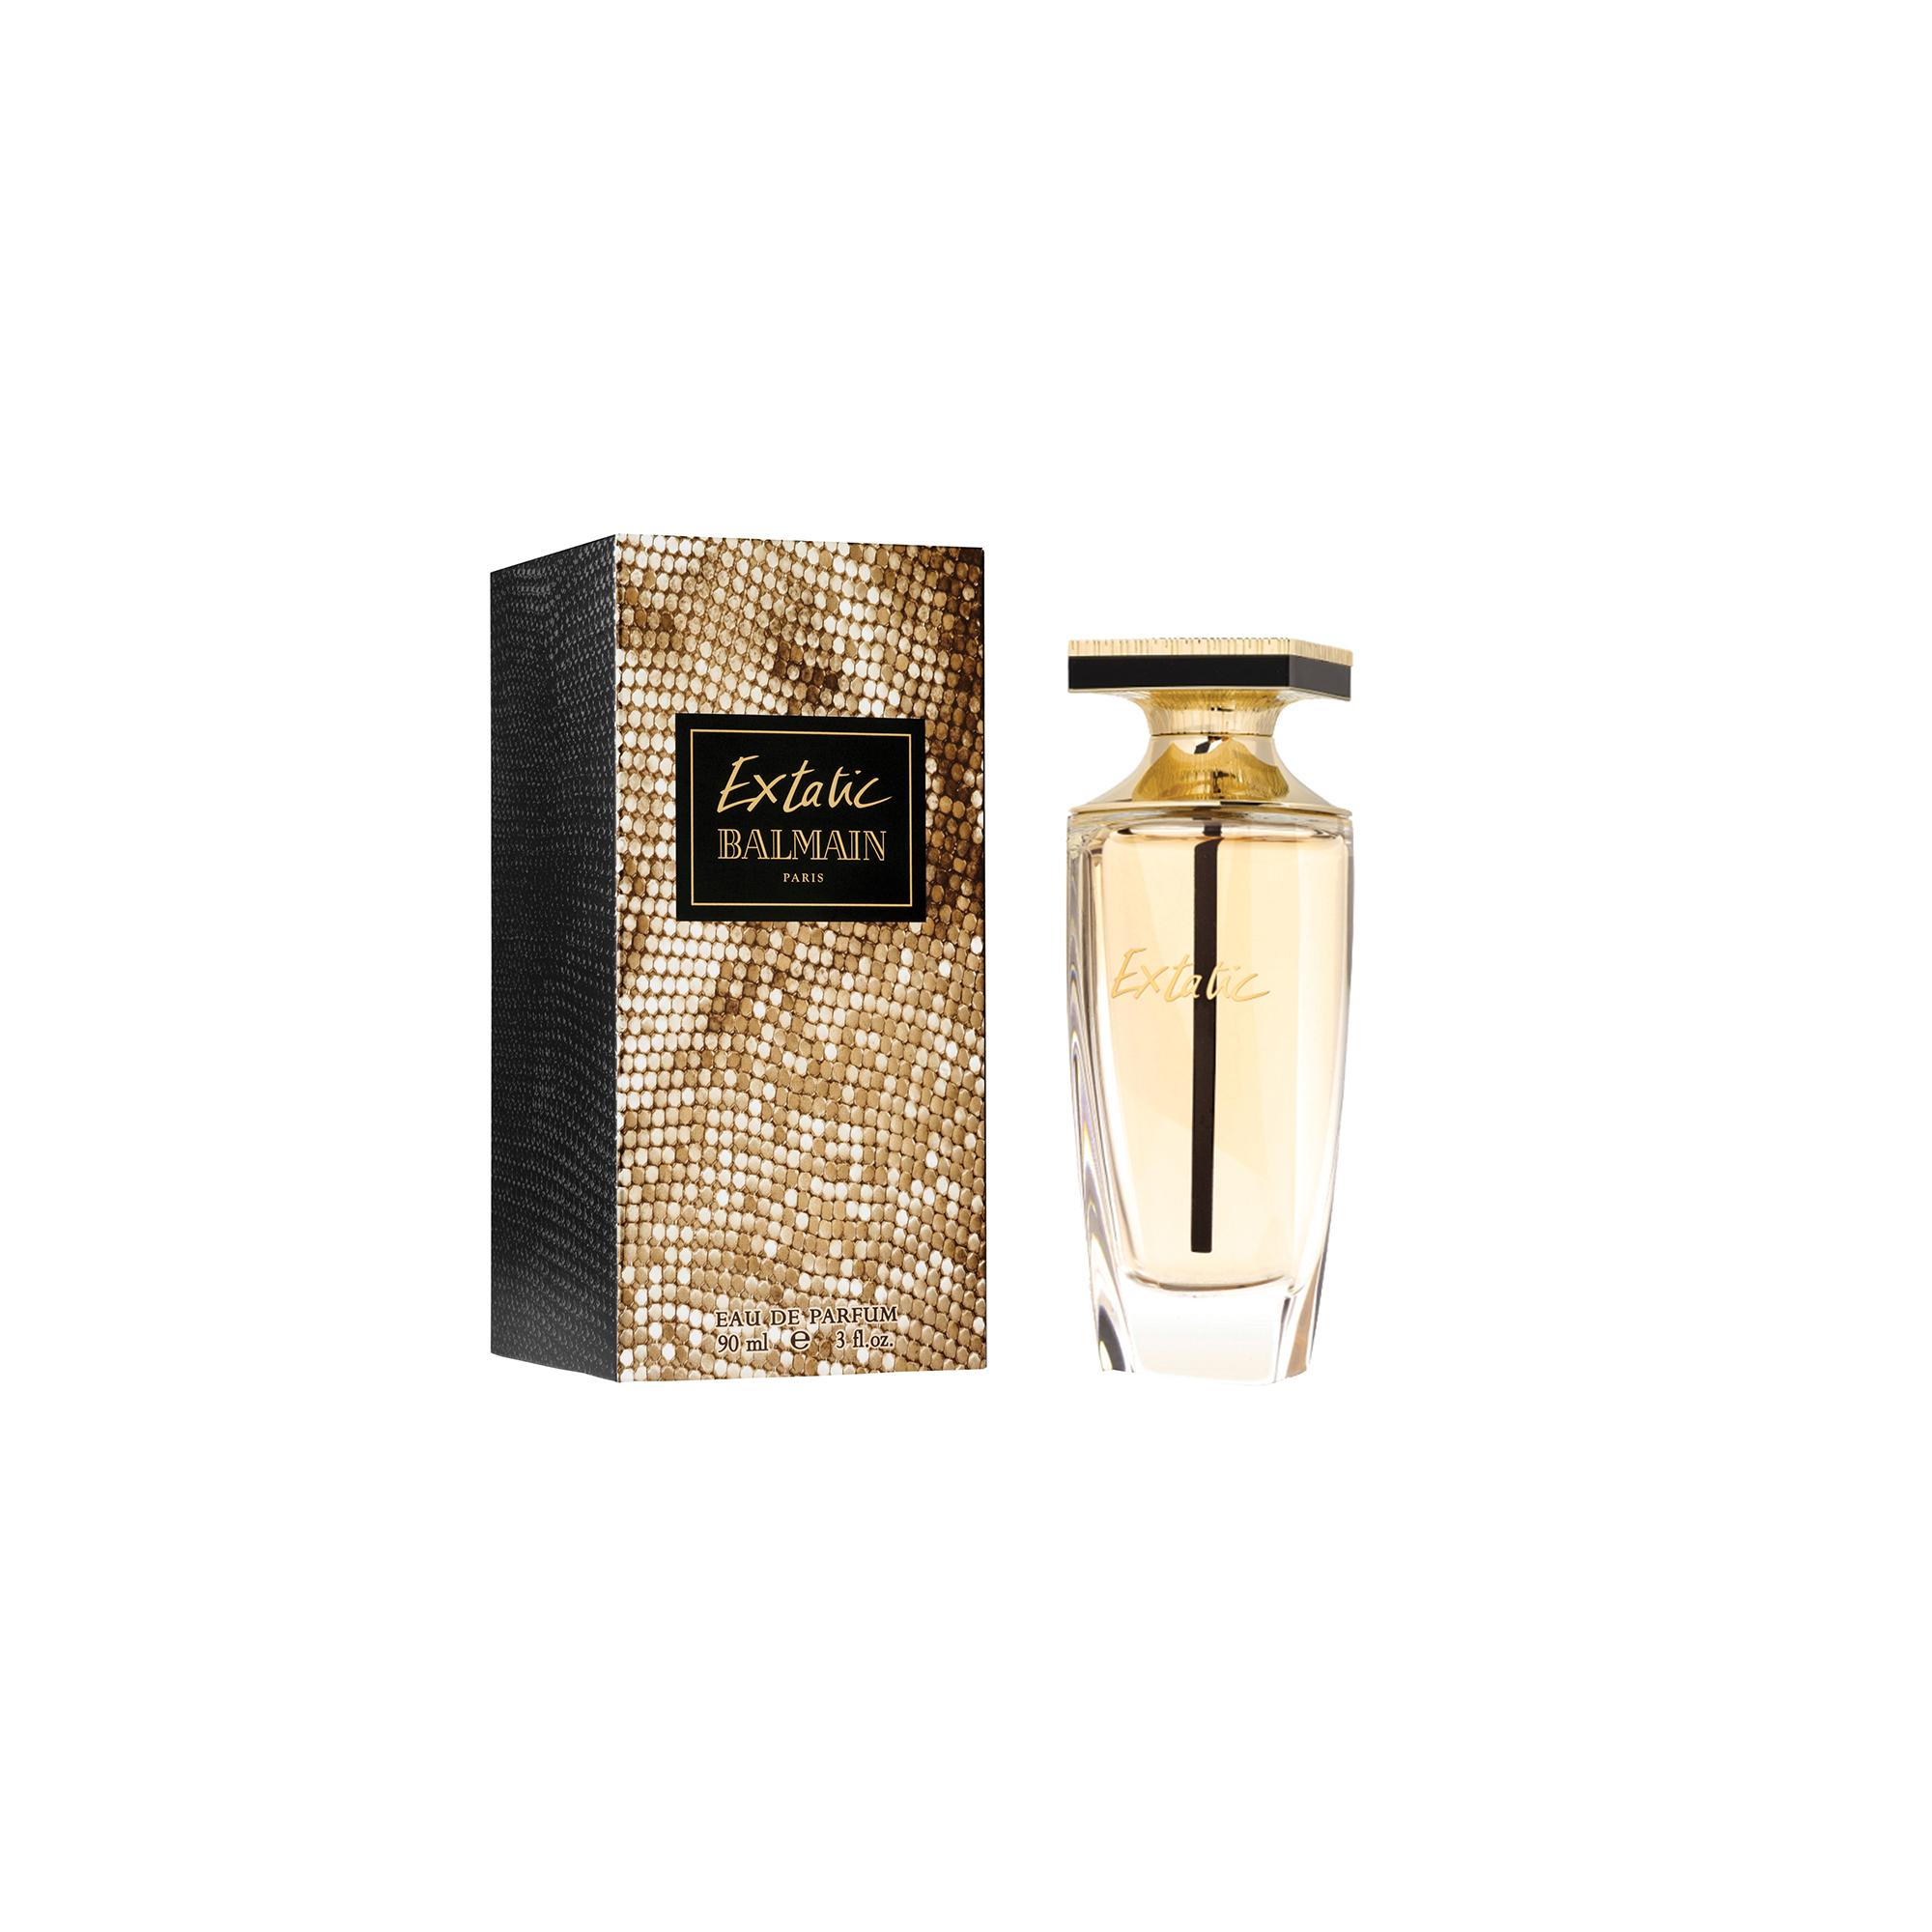 Apa de parfum Balmain Extatic